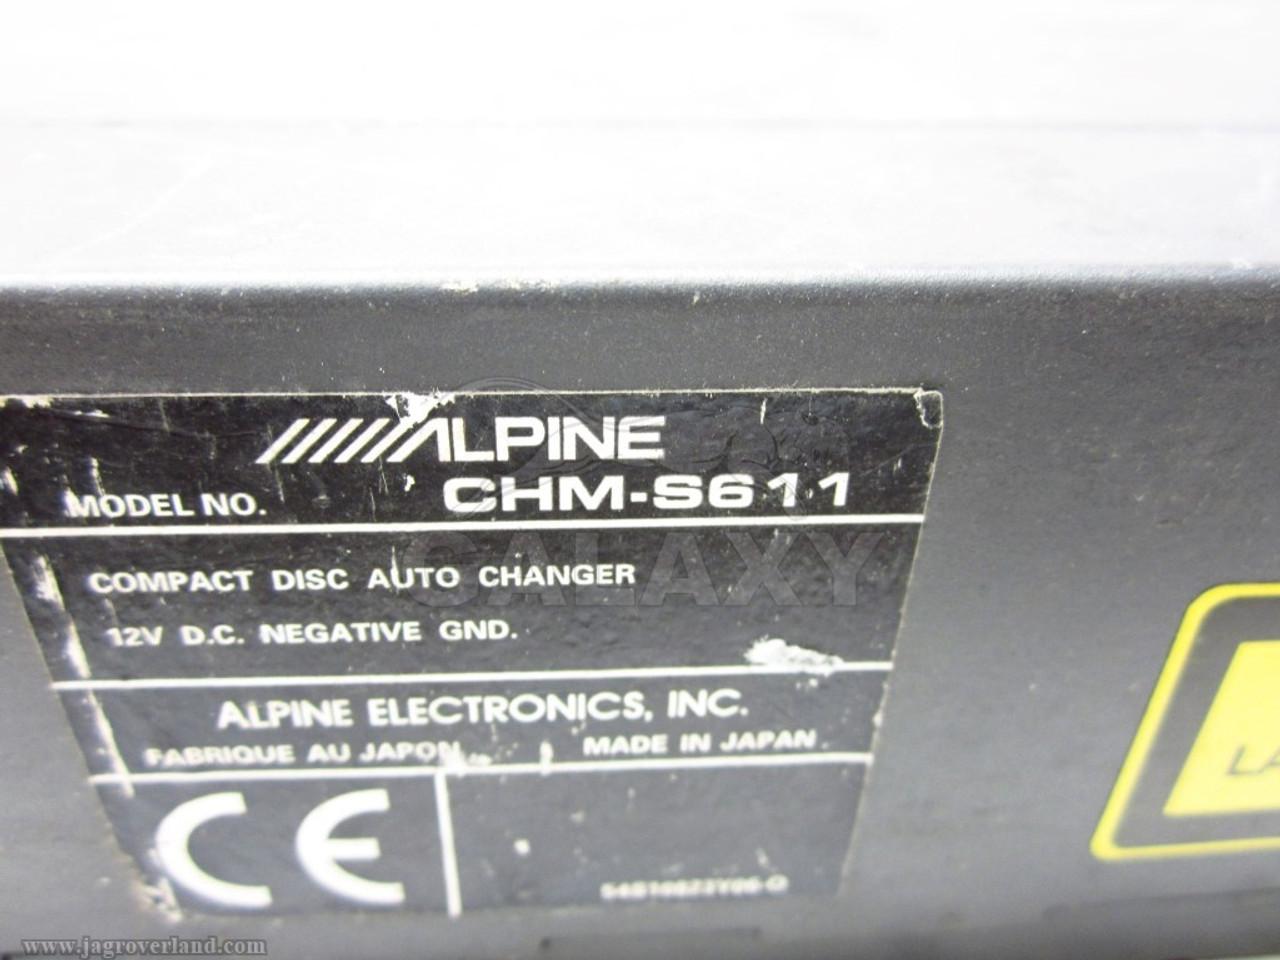 1999-2001 Bmw 318I Cd Changer Chm-S611